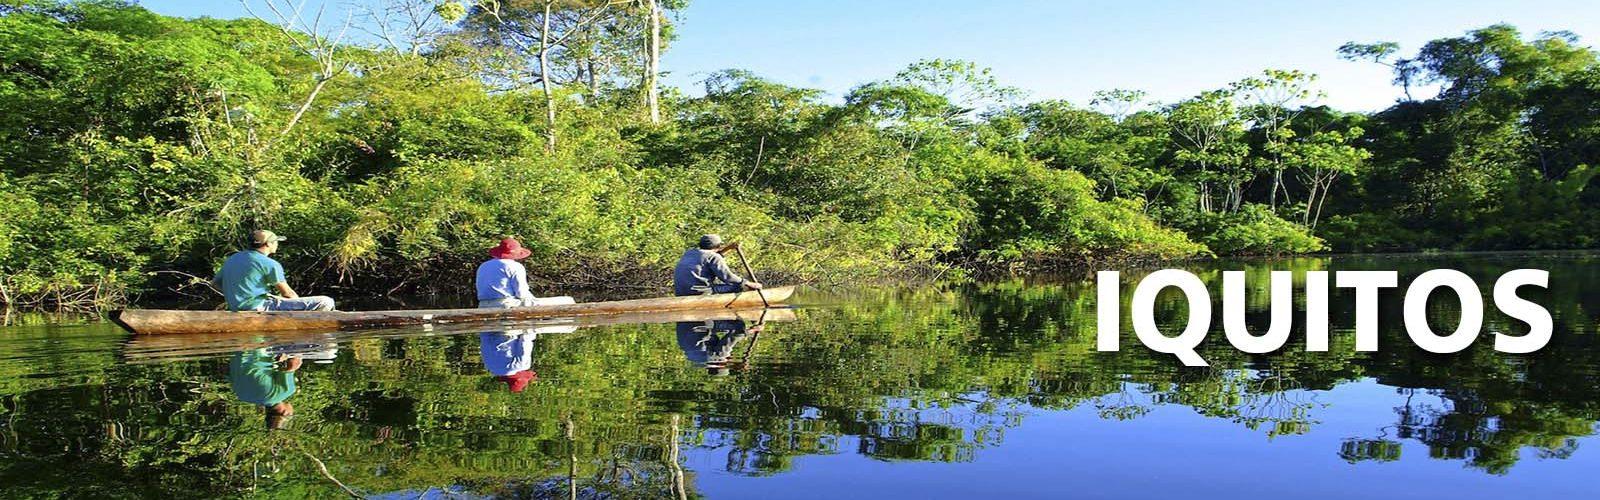 iquitos peruvian tours1